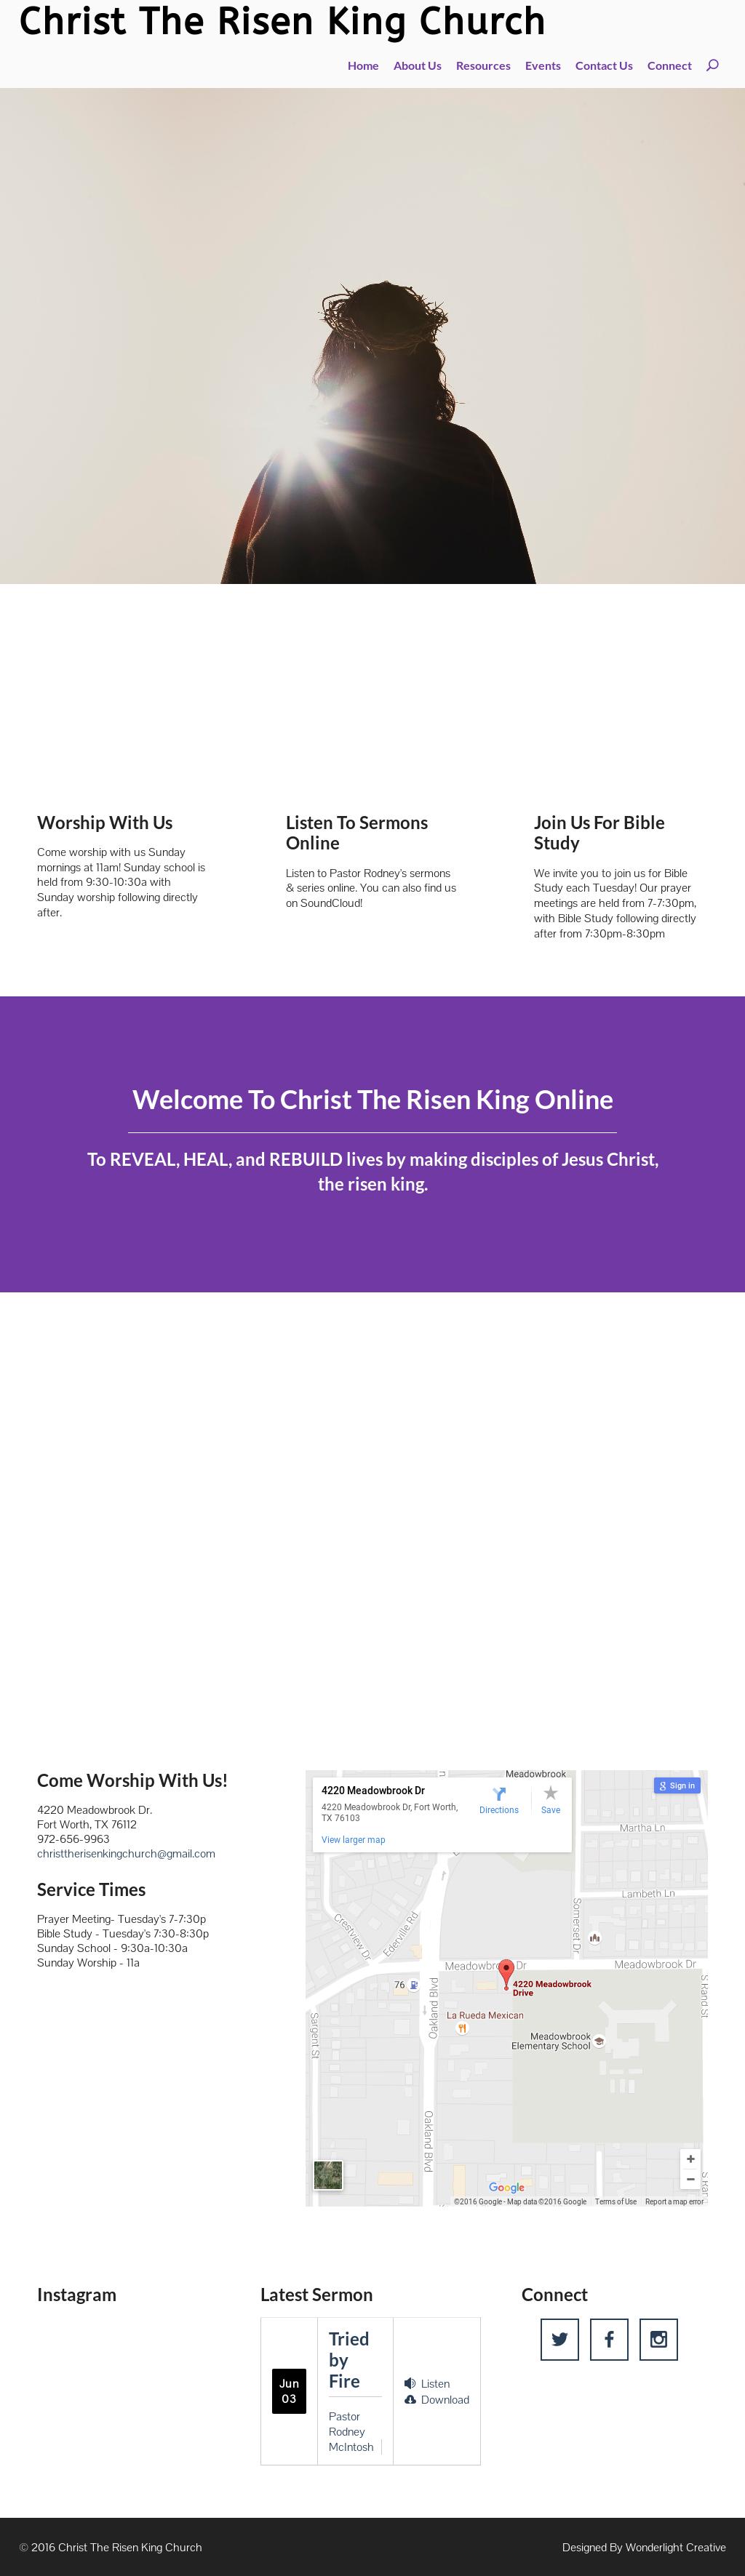 612d39db47d9 Christ The Risen King Church Competitors